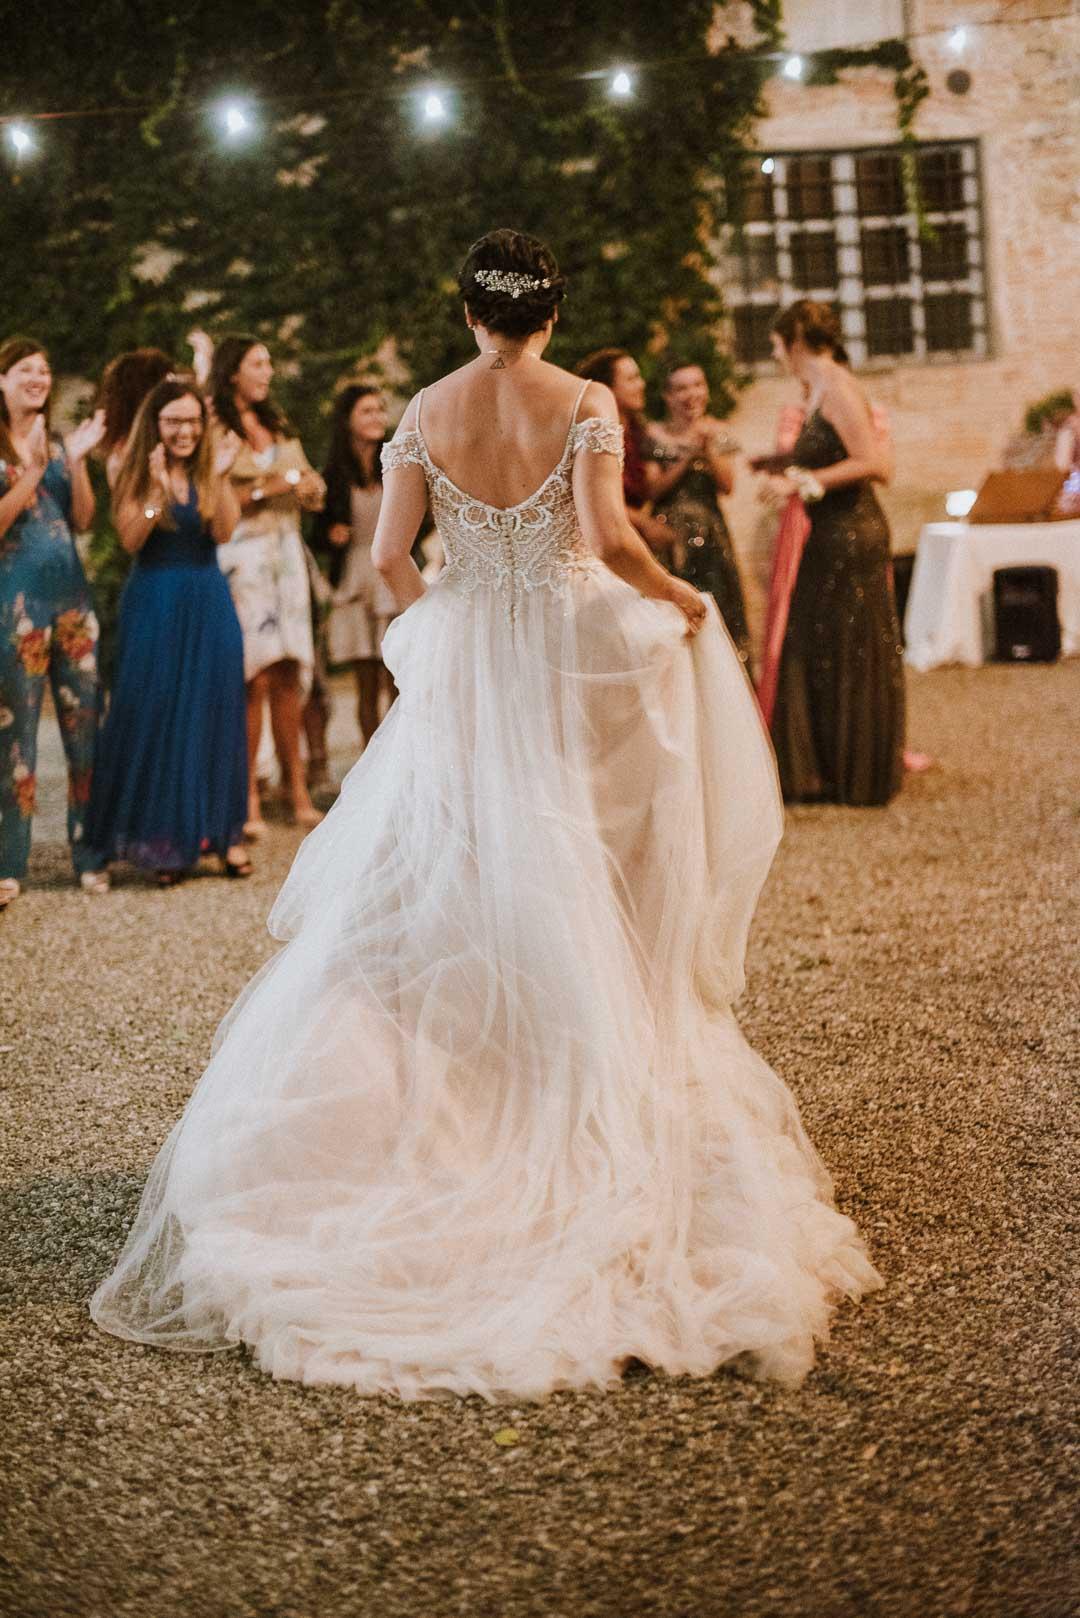 wedding-photographer-destination-fineart-bespoke-reportage-tuscany-villascorzi-vivianeizzo-spazio46-175